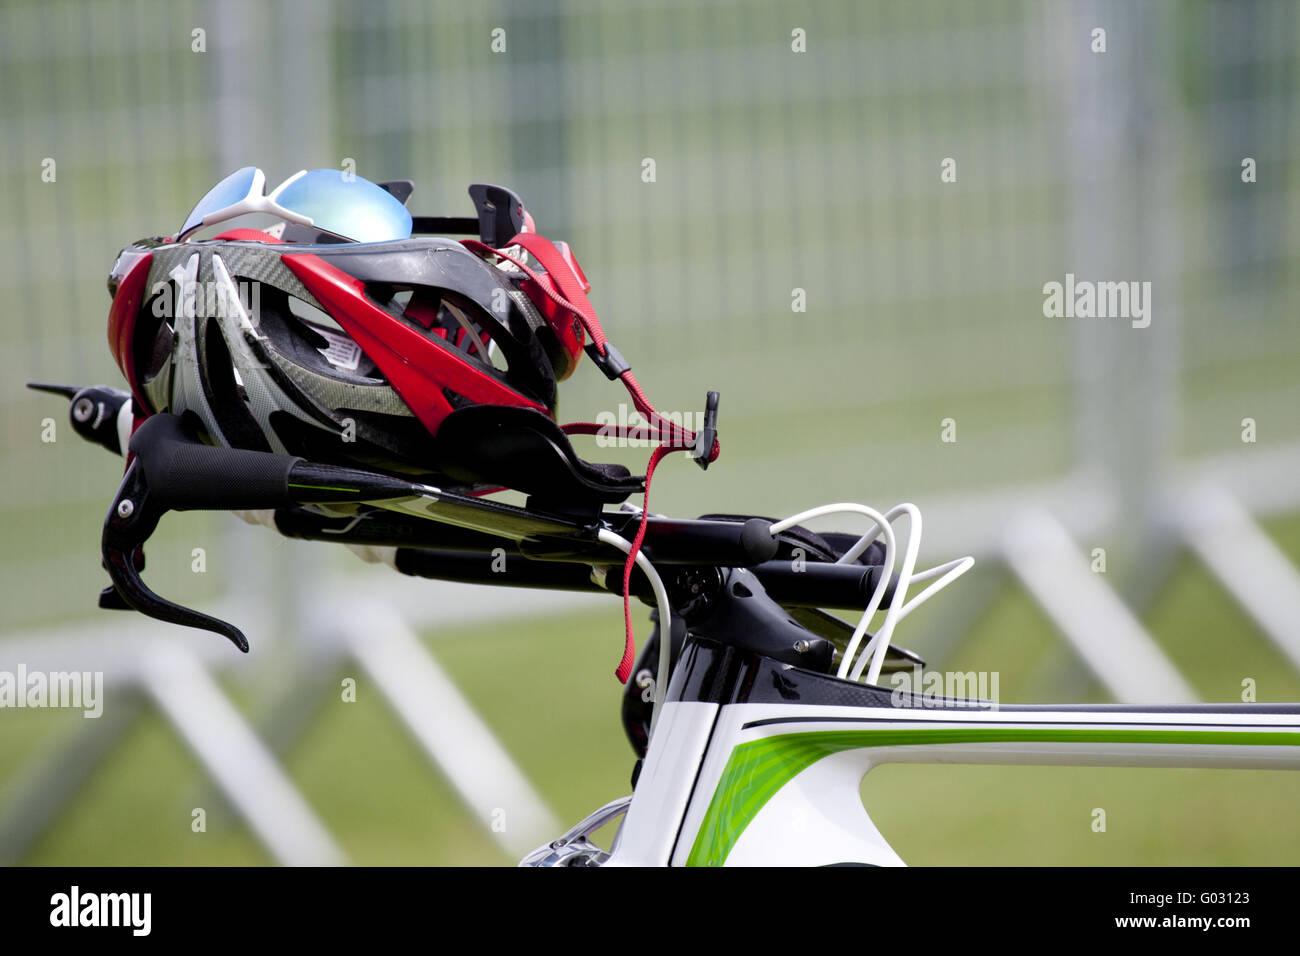 Helmet on the handlebars of a bike - Stock Image